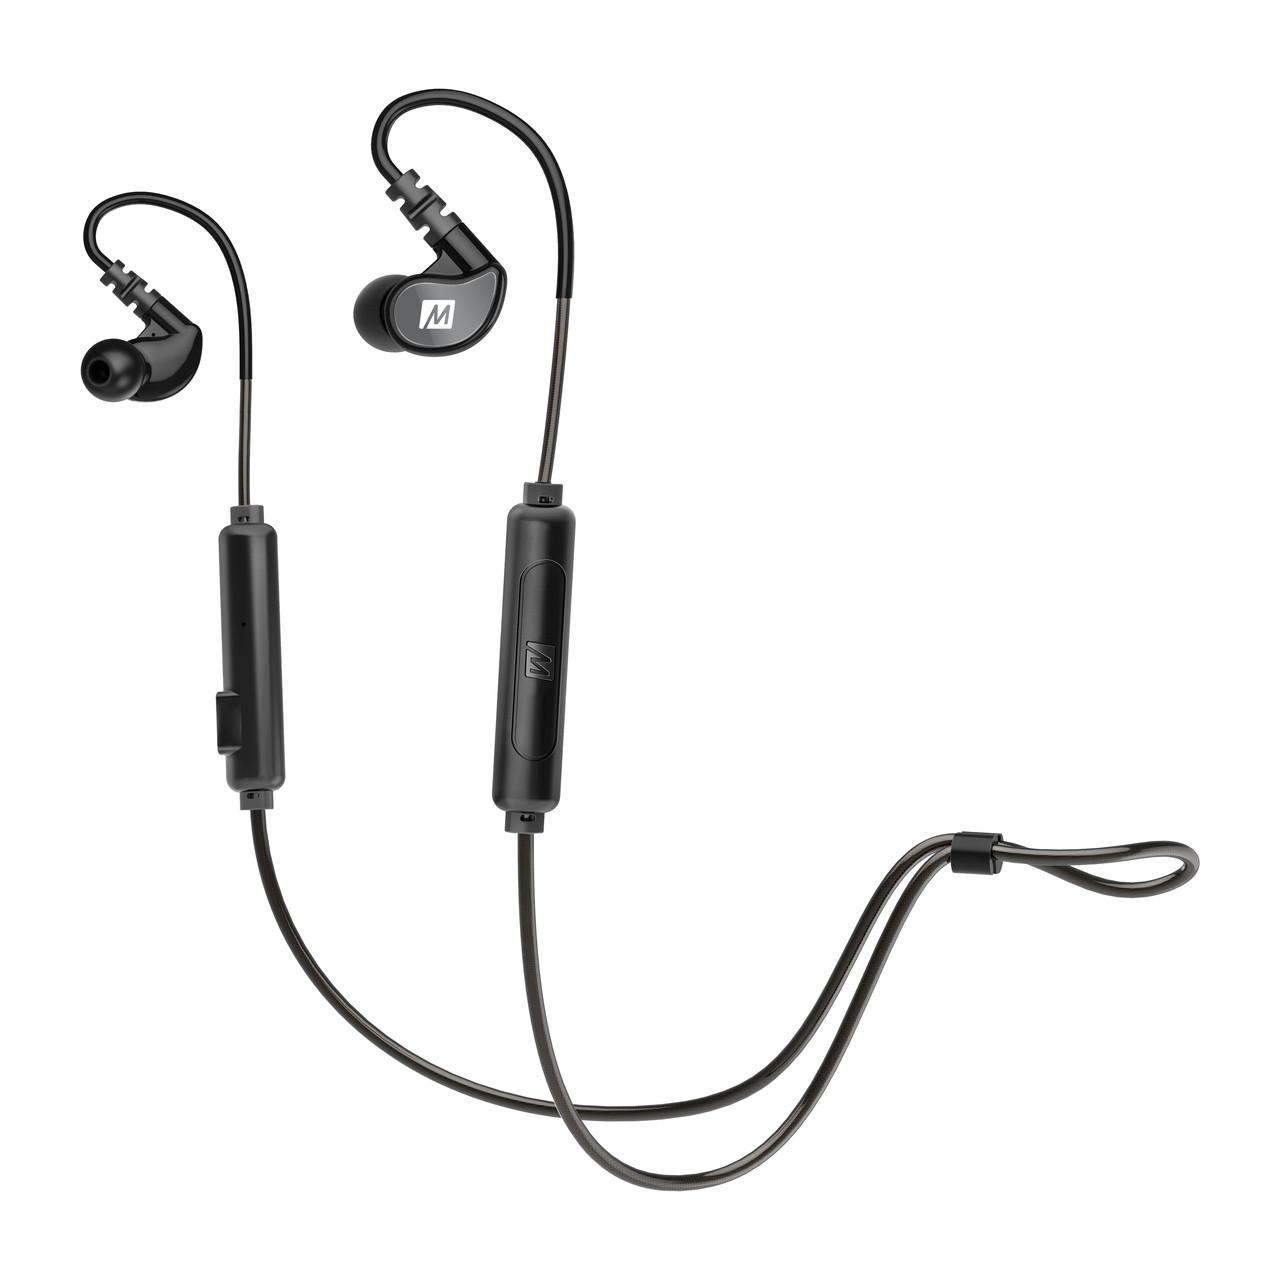 hight resolution of m6b wireless earphone 2019 version user manual